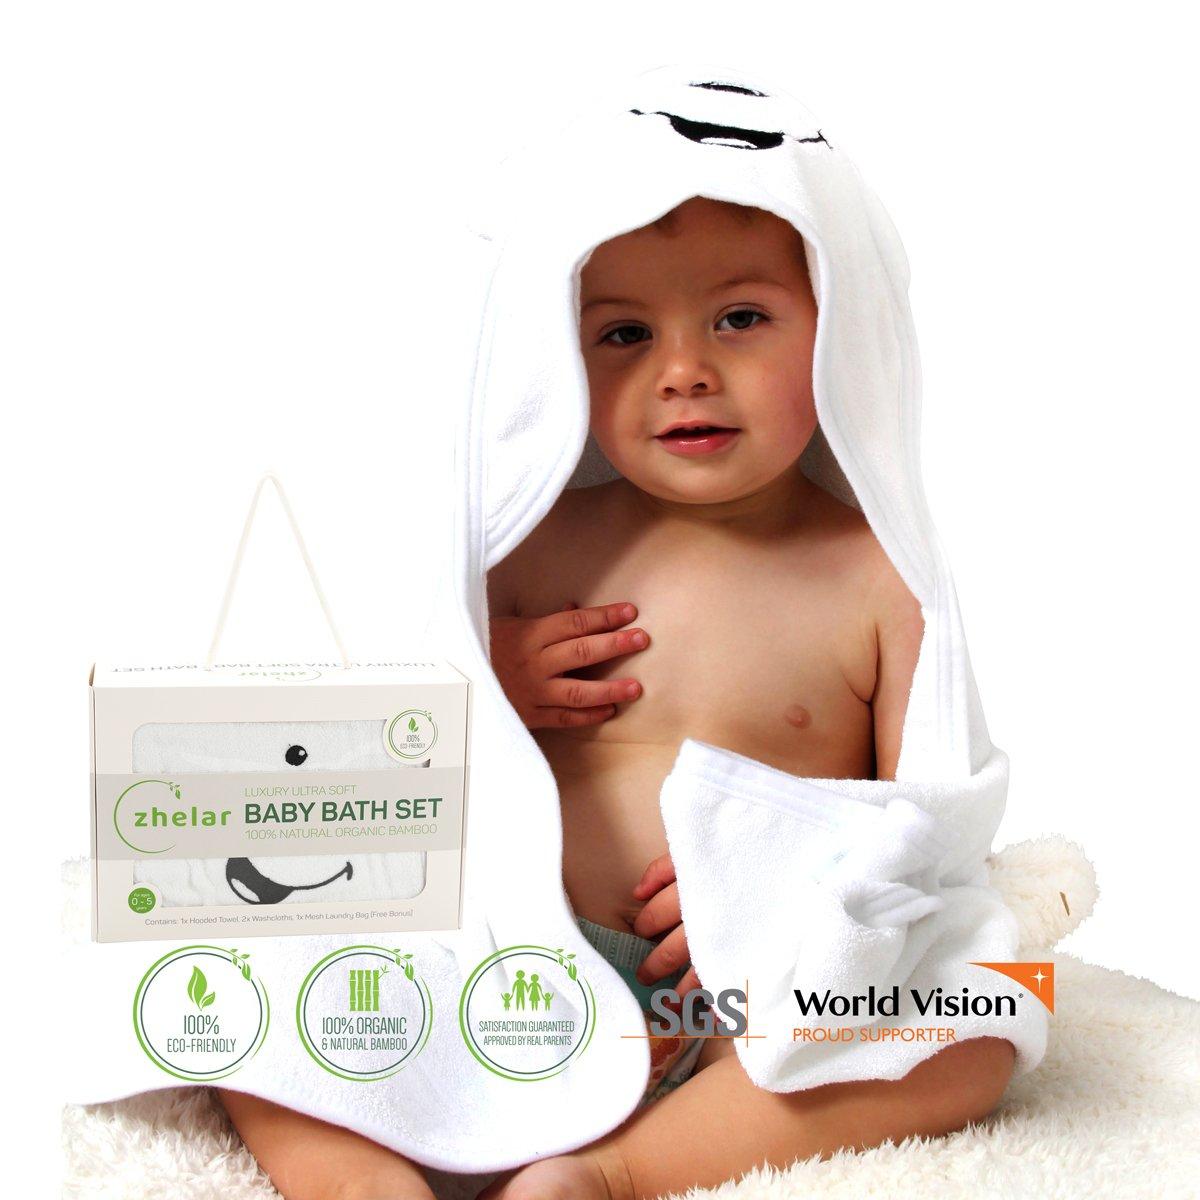 Luxury Bamboo Baby Bath Set | Hooded Towel with Ears & 2 Washcloths | Organic, Ultra Soft, Extra Large | Perfect Shower Gift for Newborn, Infant, Toddler | Bonus Laundry Bag | ZHELAR AllThingsTogether ZHL-PBBT-SET2GRN